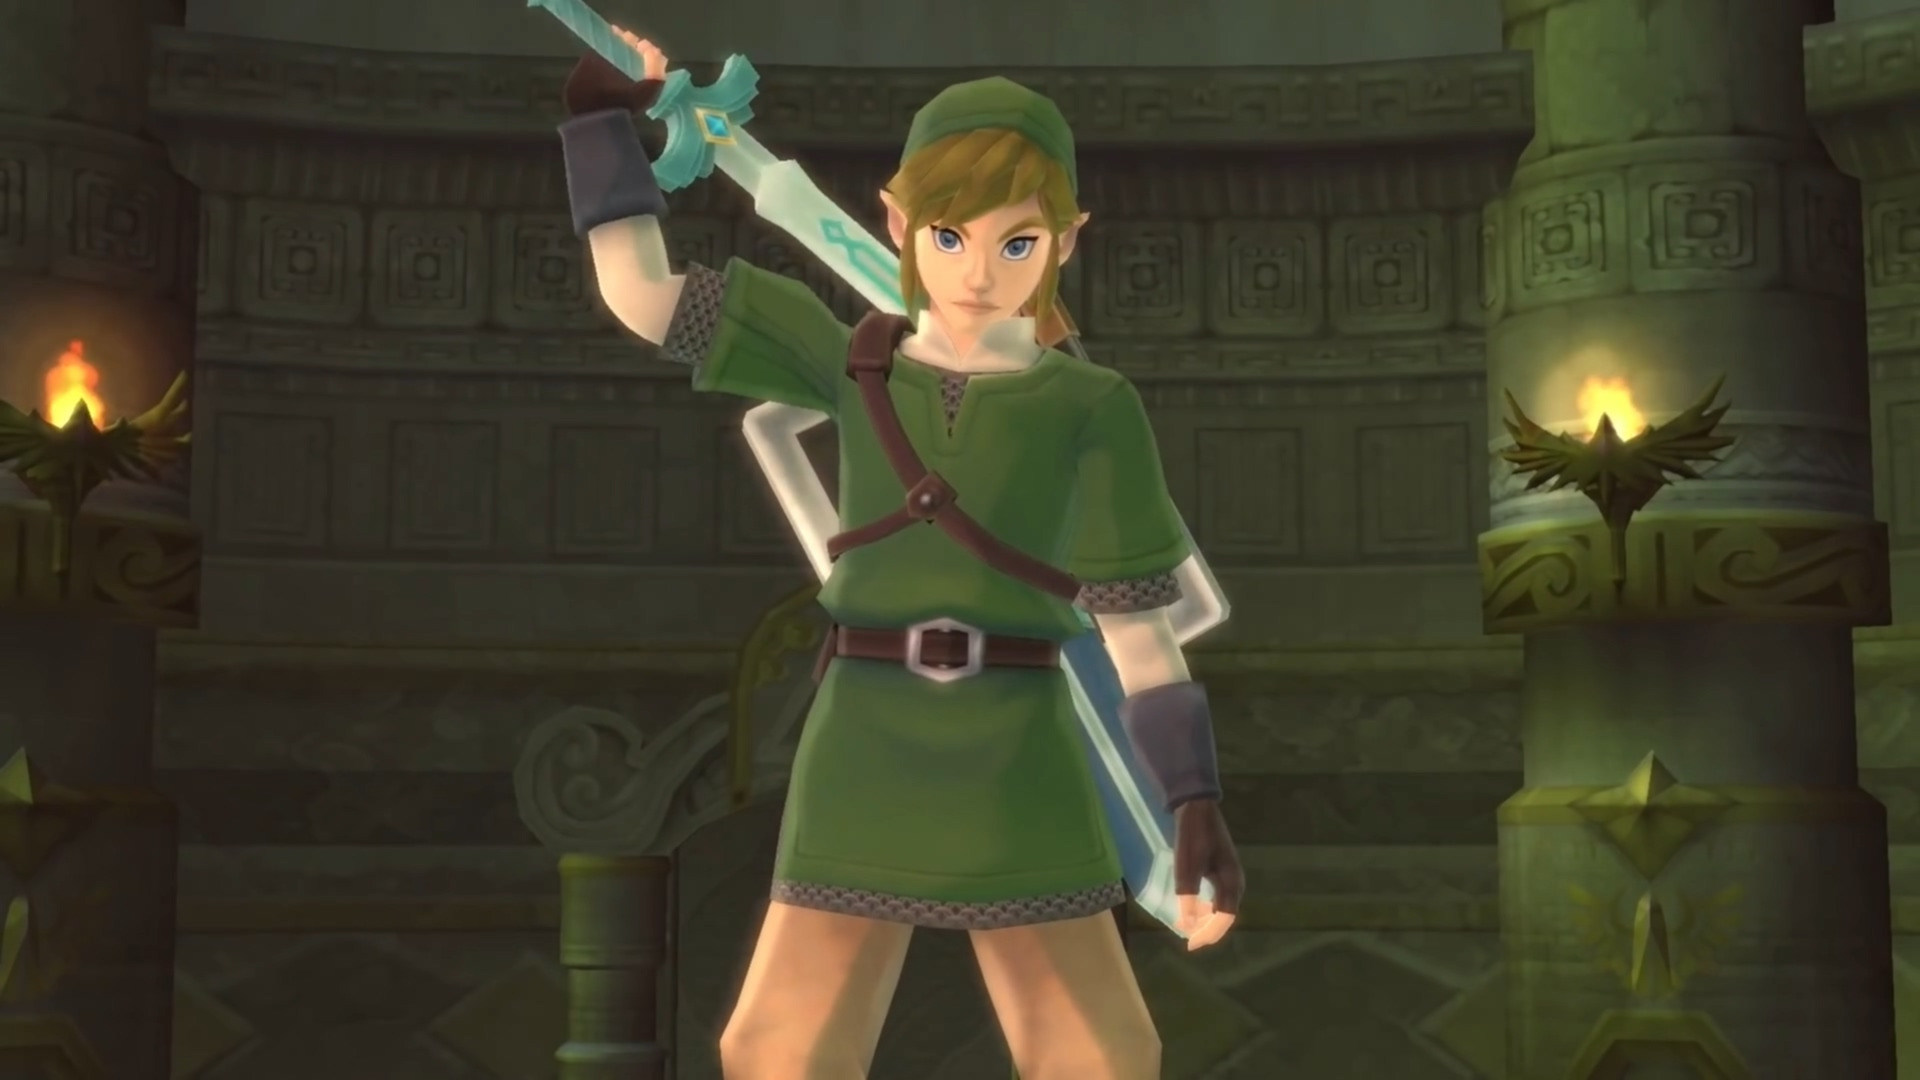 Trailer, Nintendo, Nintendo Switch, Rollenspiel, Switch, The Legend of Zelda, Zelda, RPG, Skyward Sword, Skyward Sword HD, The Legend of Zelda: Skyward Sword HD, The Legend of Zelda: Skyward Sword